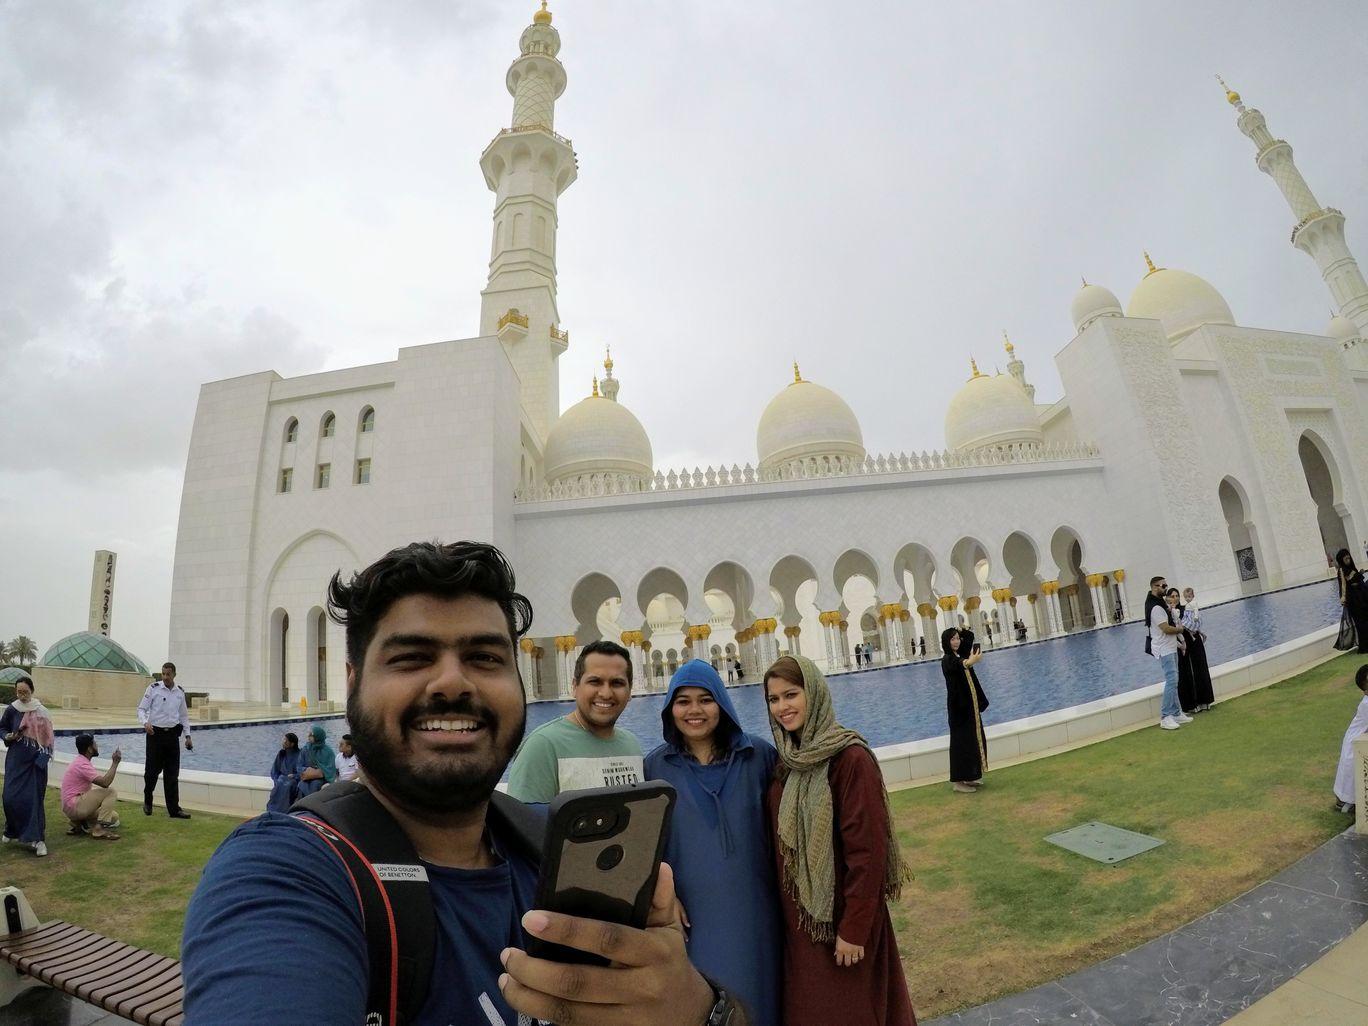 Photo of Grand Mosque South Gate Abu Dhabi - Abu Dhabi - United Arab Emirates By Elton D'souza